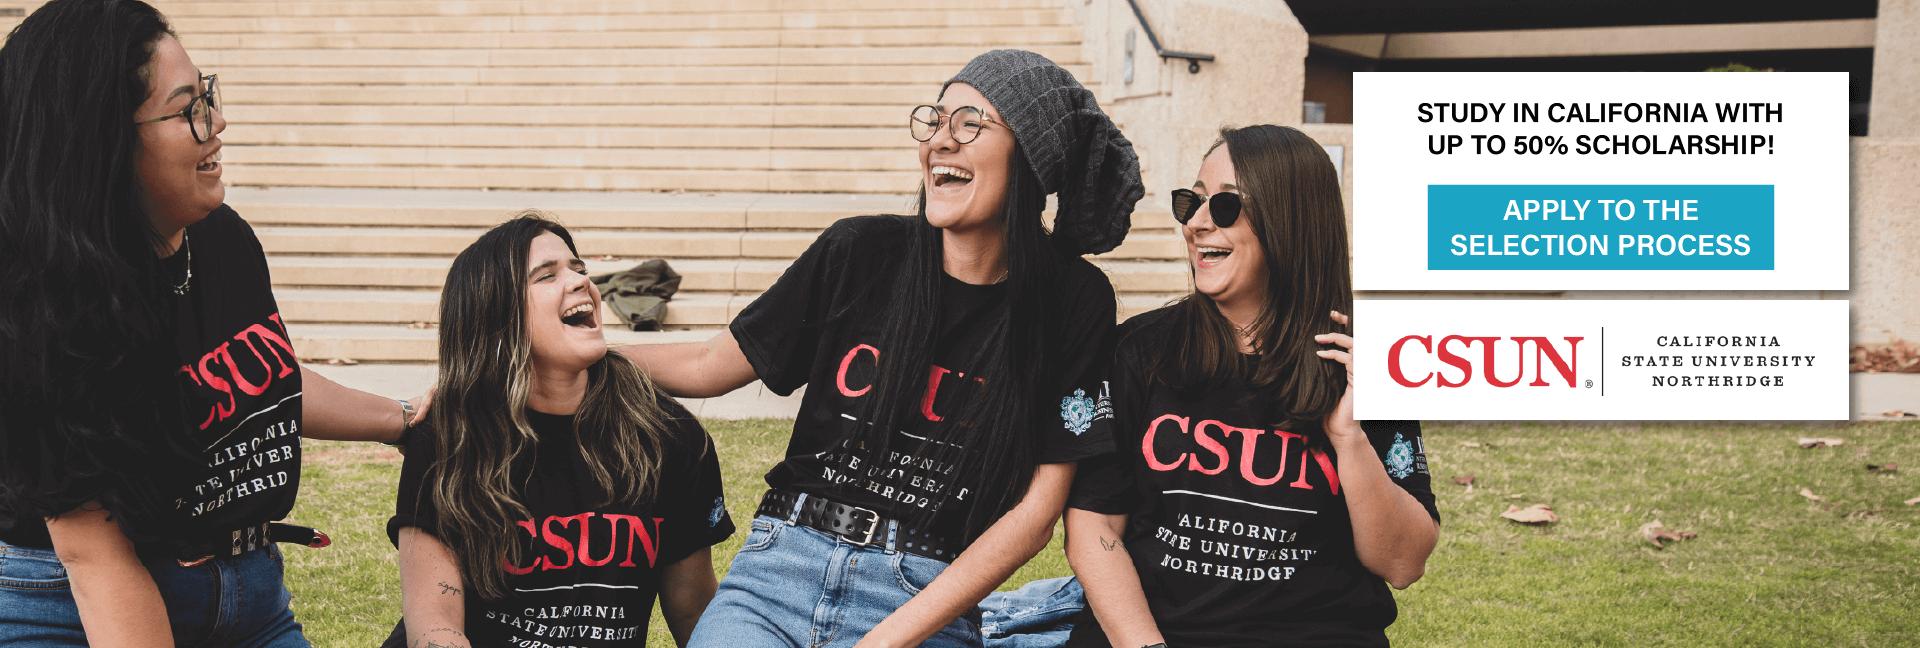 Study in CSUN!